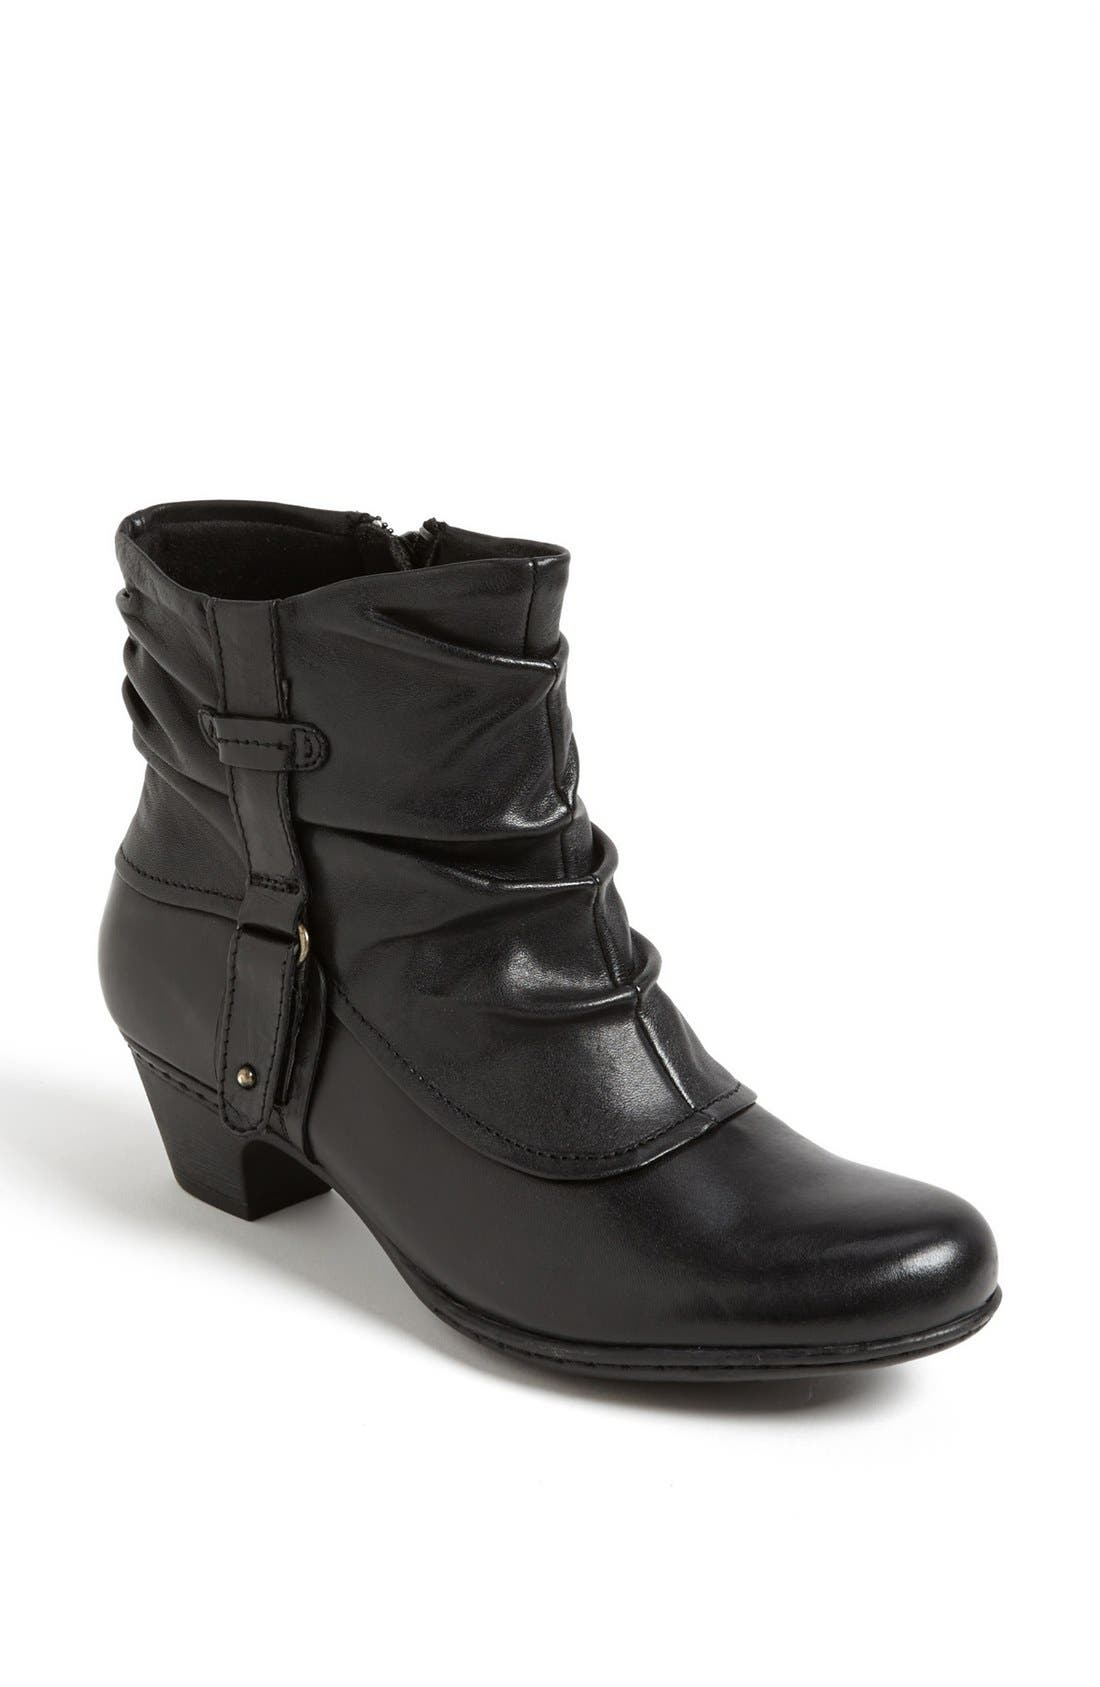 Rockport Cobb Hill 'Alexandra' Boot